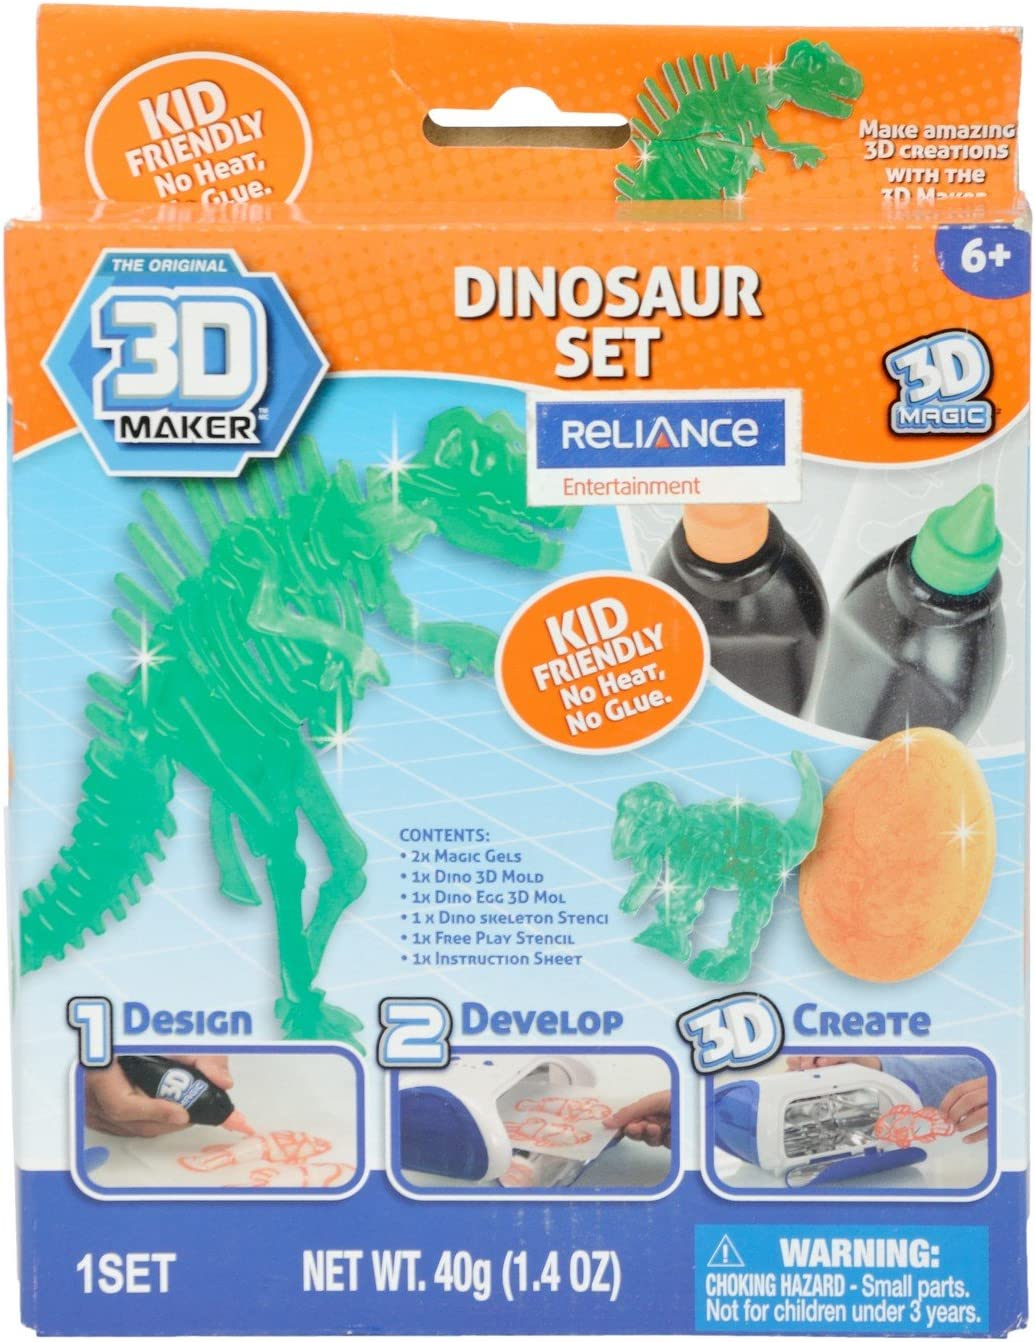 3D Maker Dinosaur Expansion Pack by 3d Magic: Amazon.es: Juguetes y juegos